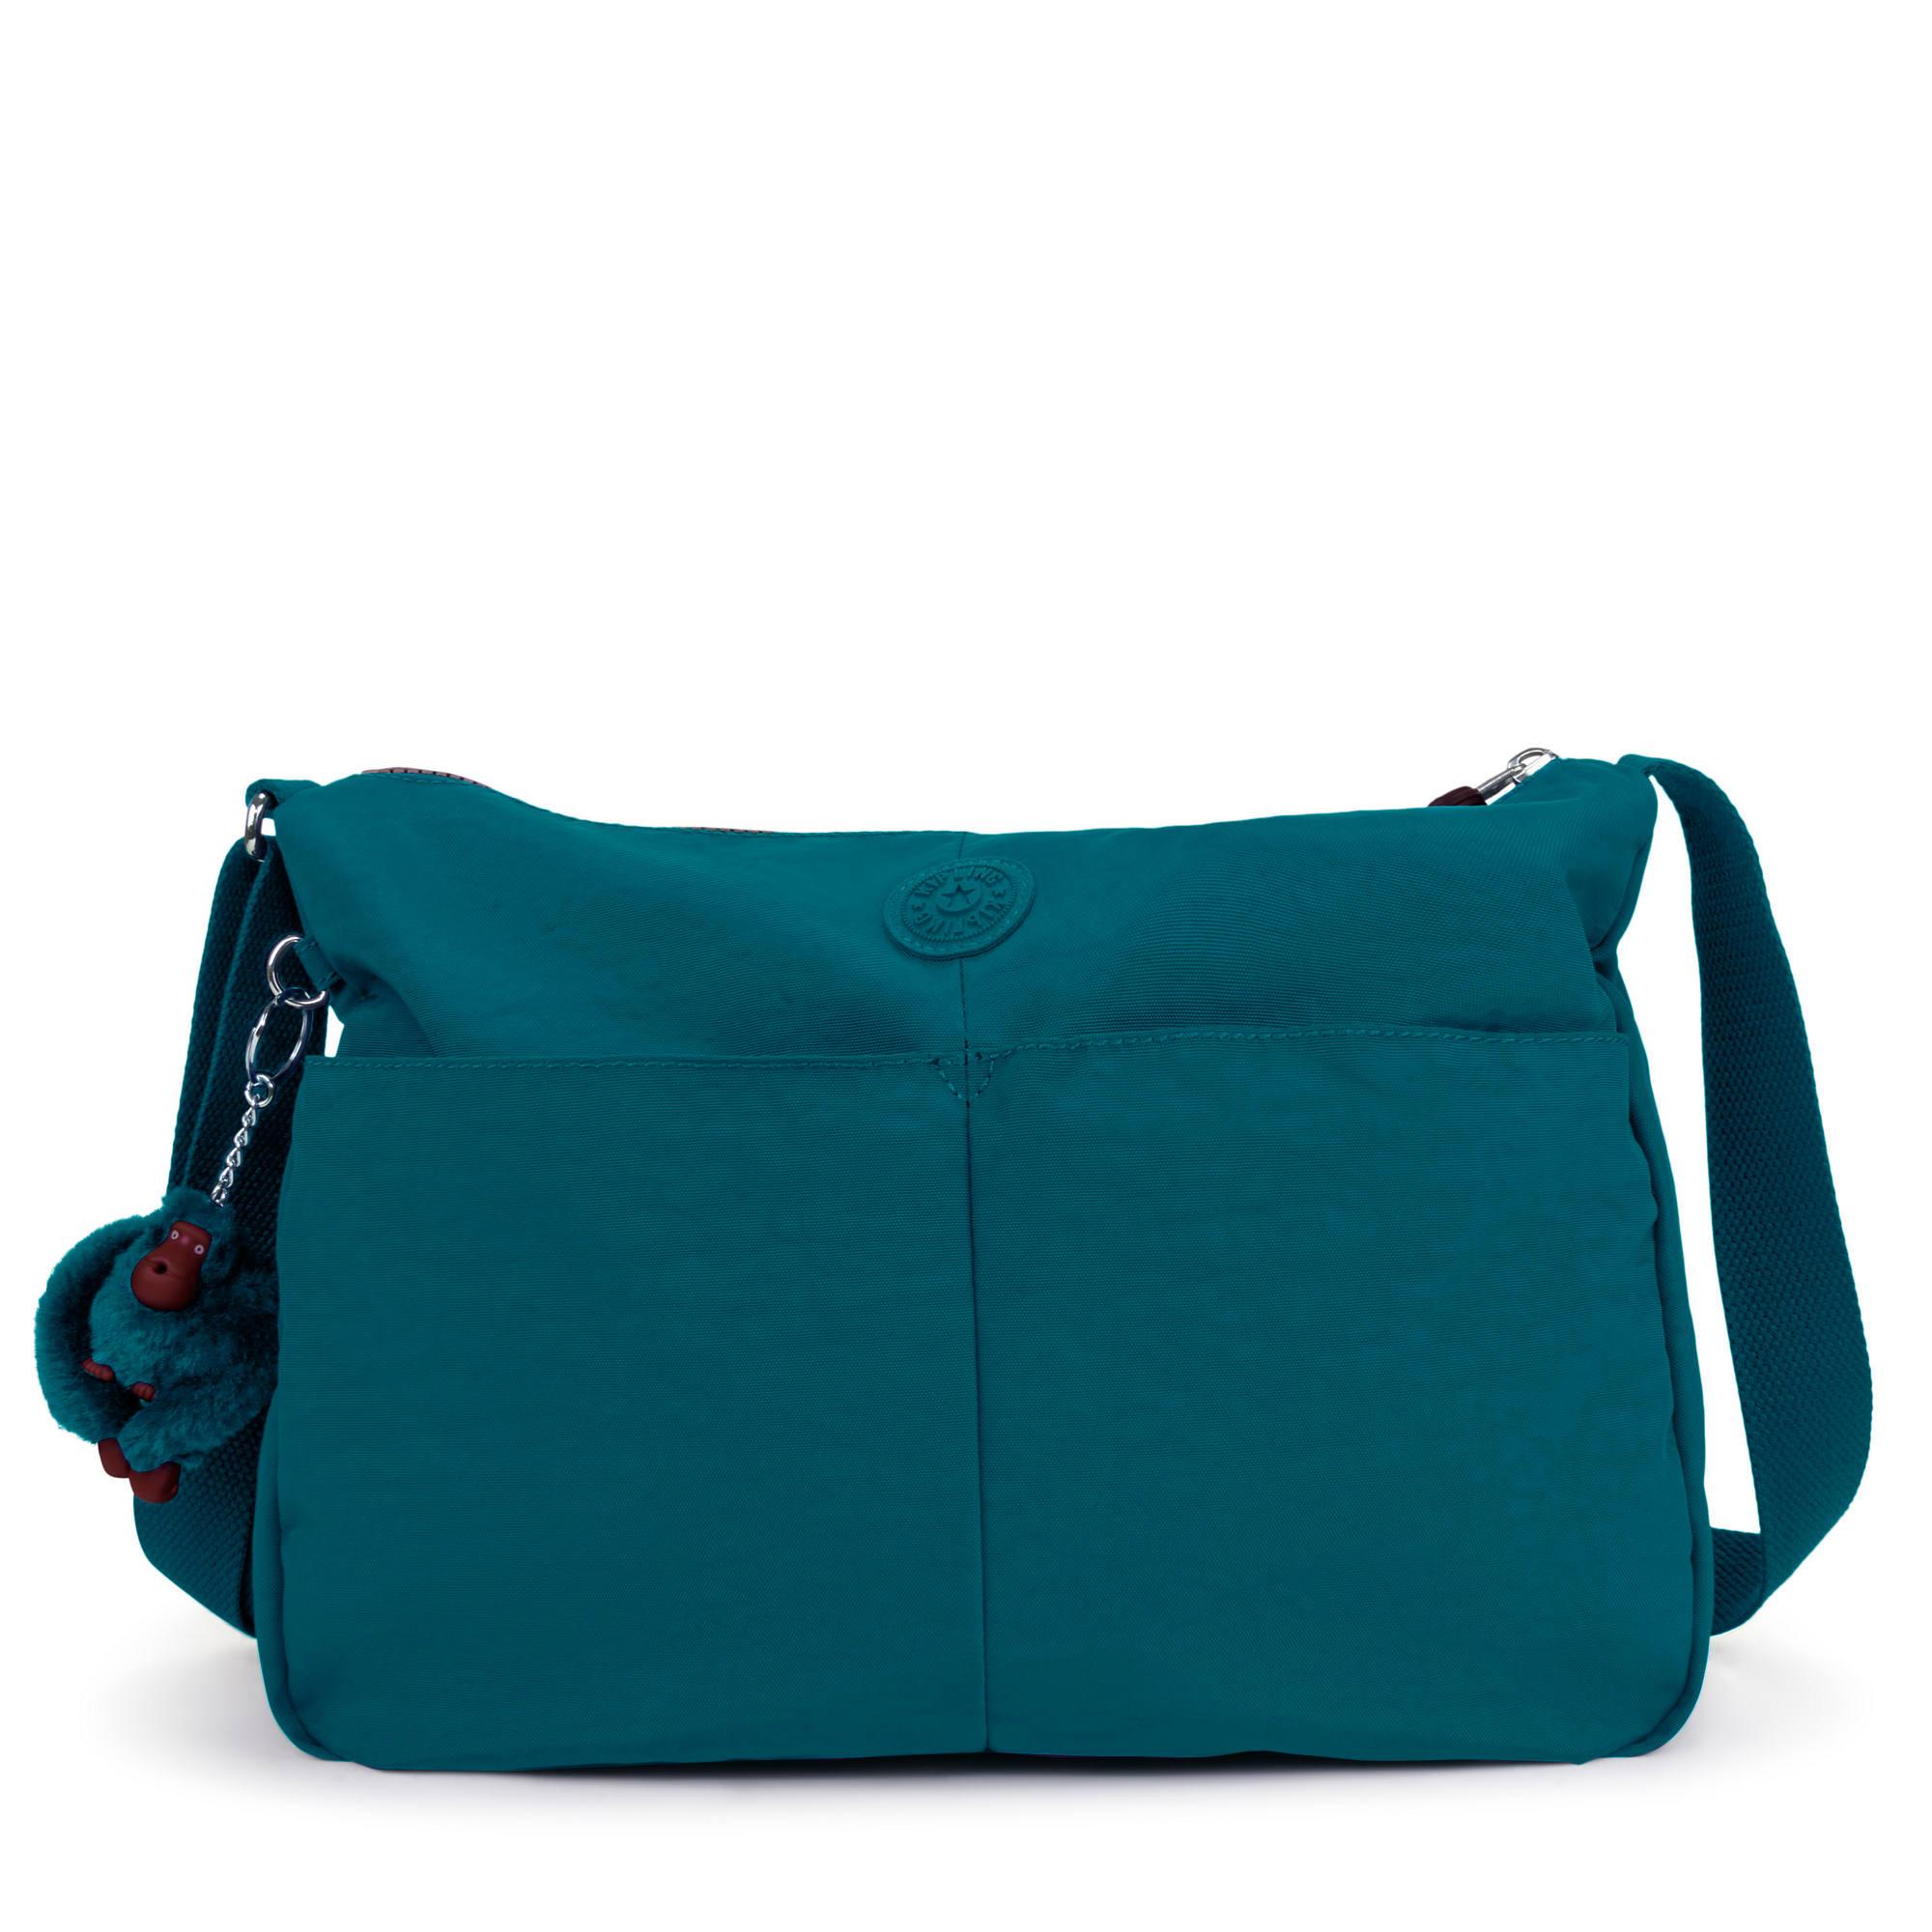 59807a14abf5d1 Rosita Crossbody Bag,Gleaming Green,large